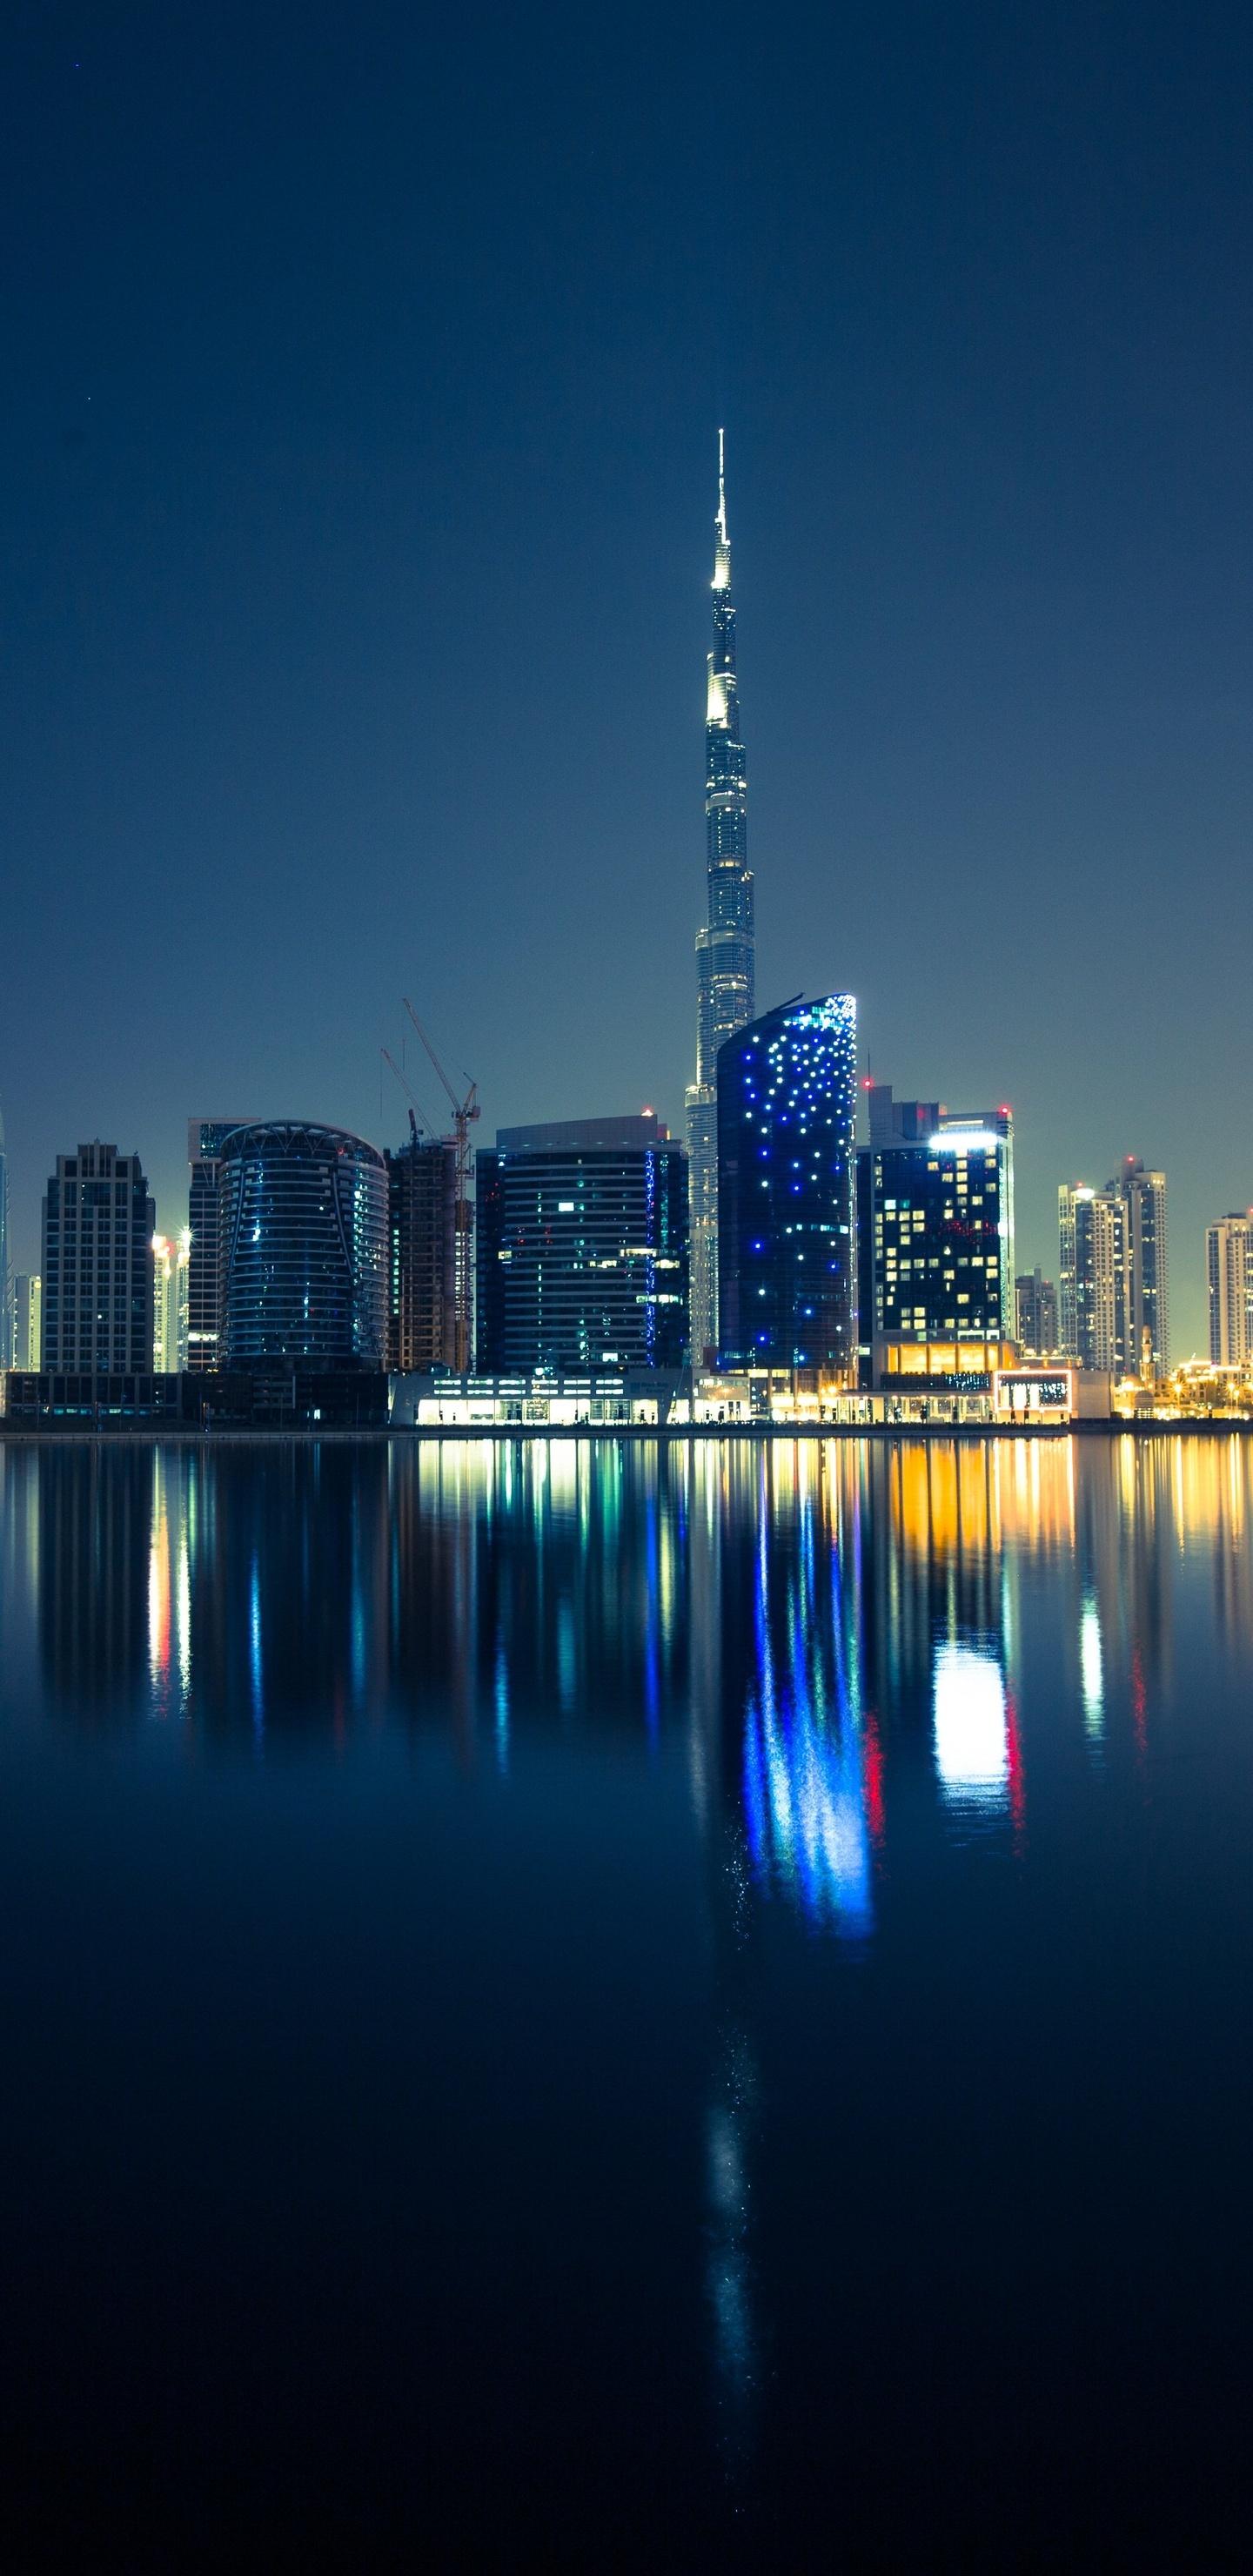 dubai-skyscrapers-emirates-uae-night-5k-r3.jpg